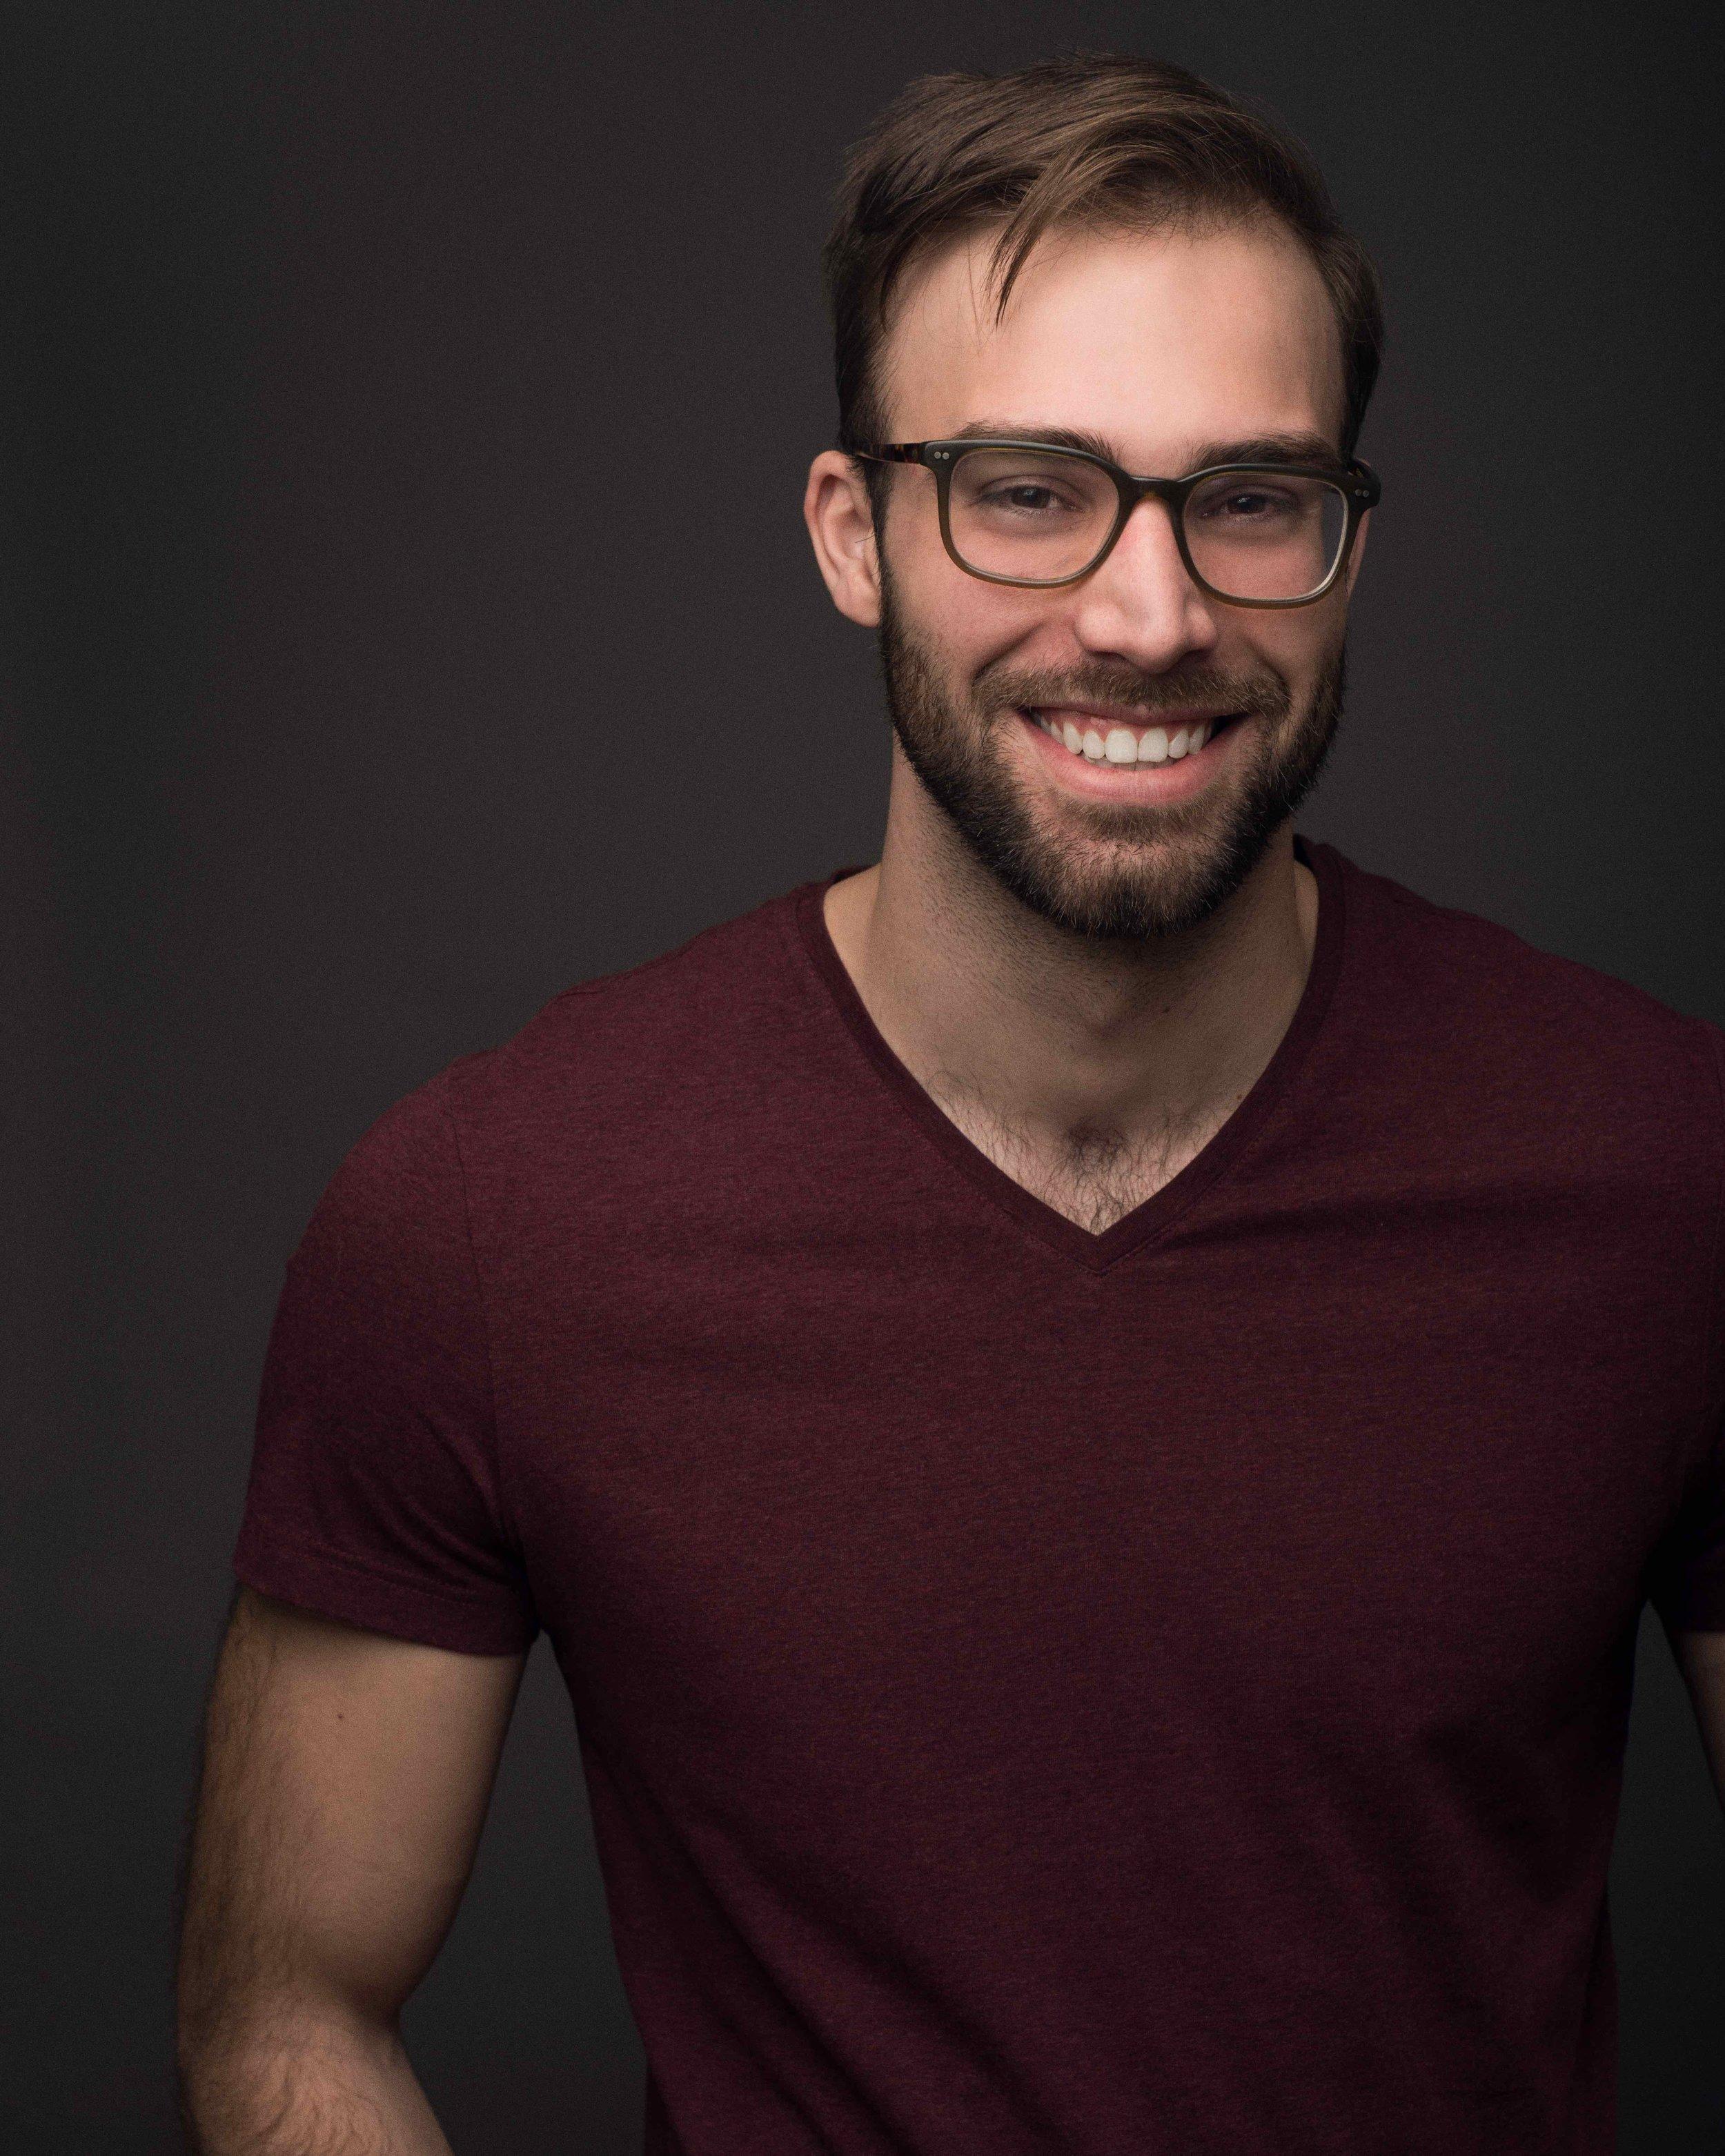 Dylan Palladino Beard Commercial.jpg